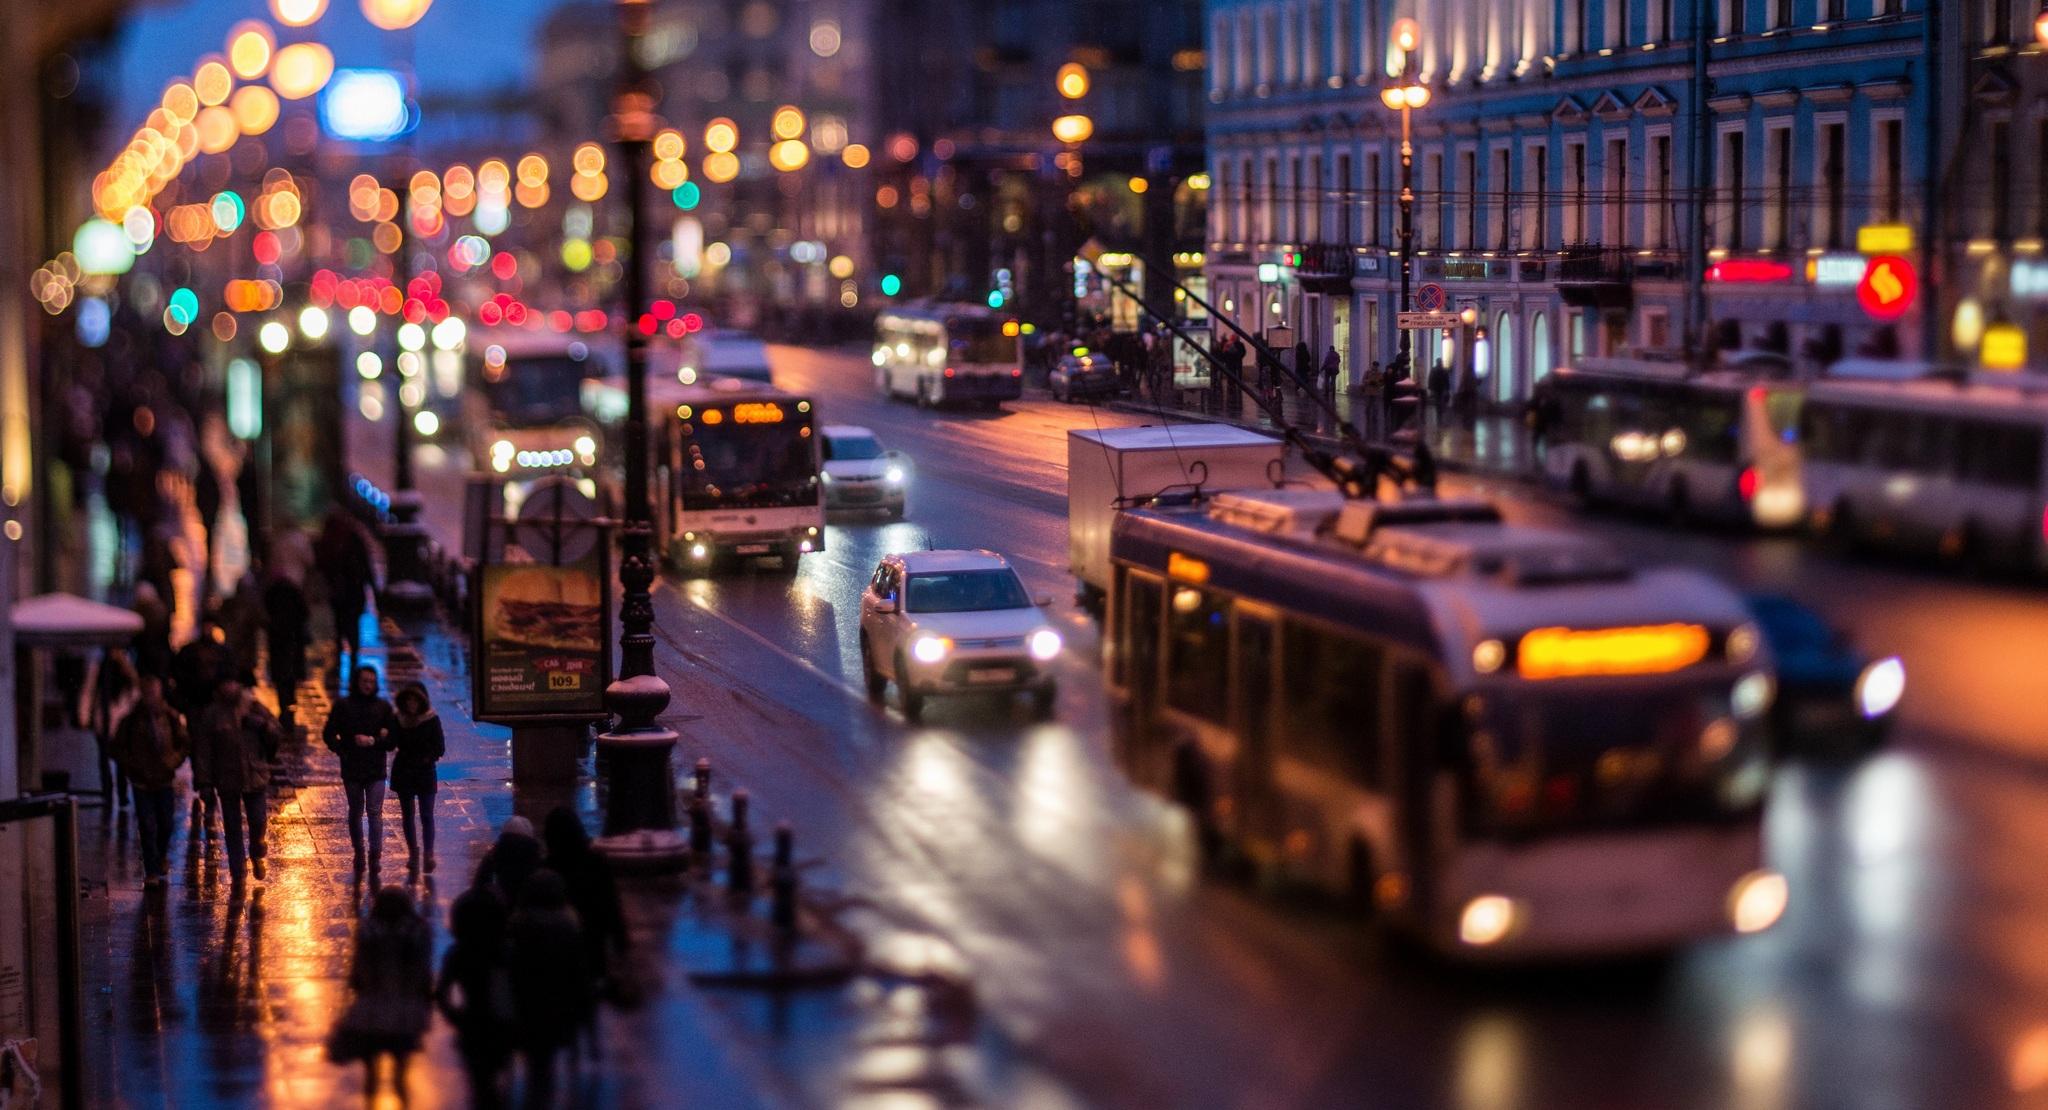 В Петербурге утвердили программу по ВИЧ